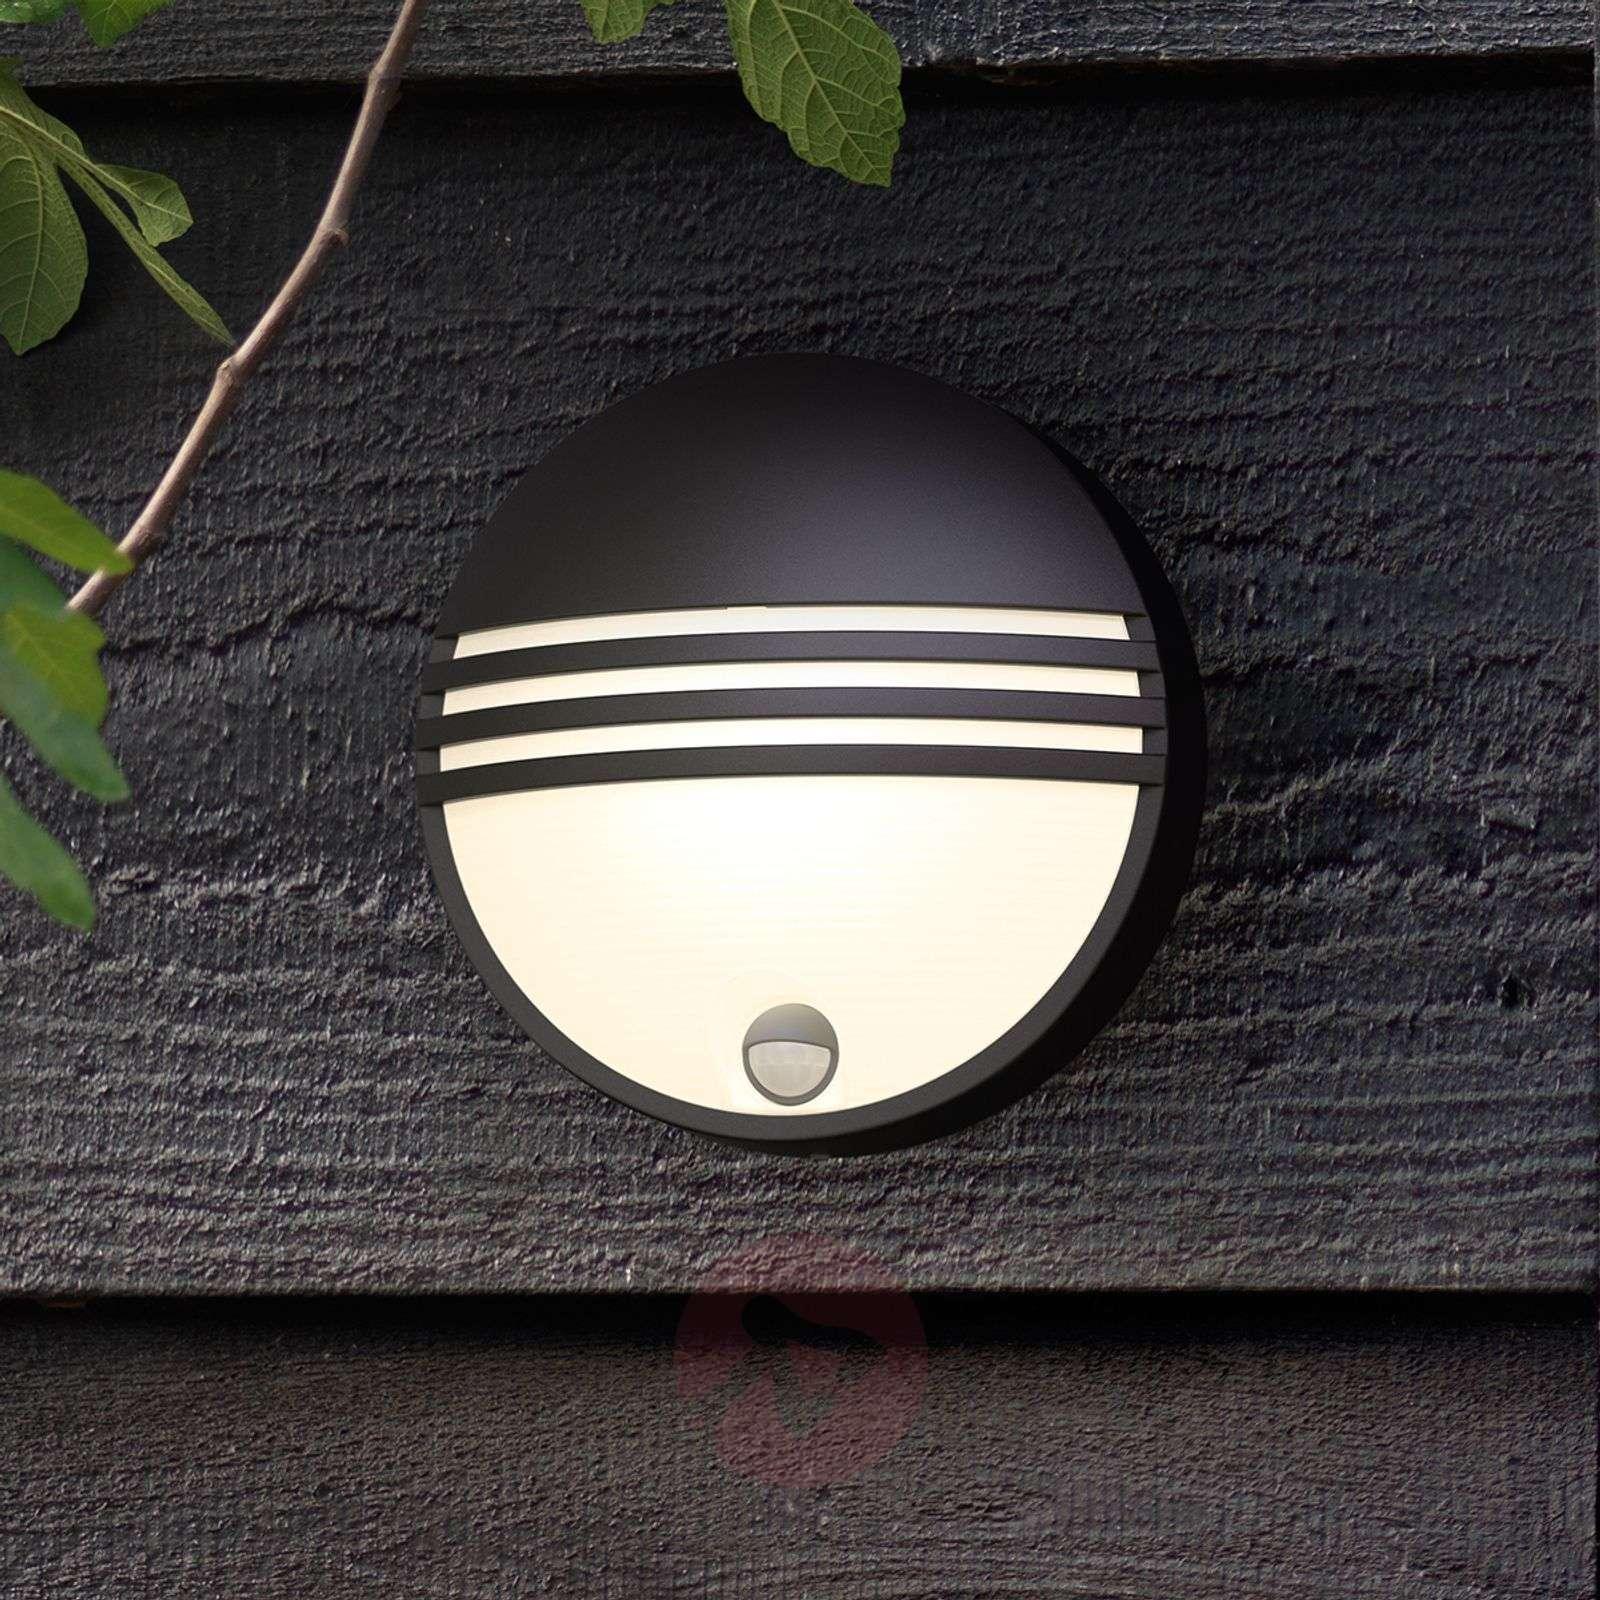 Philips Yarrow LED outdoor wall light with sensor-7531793-01